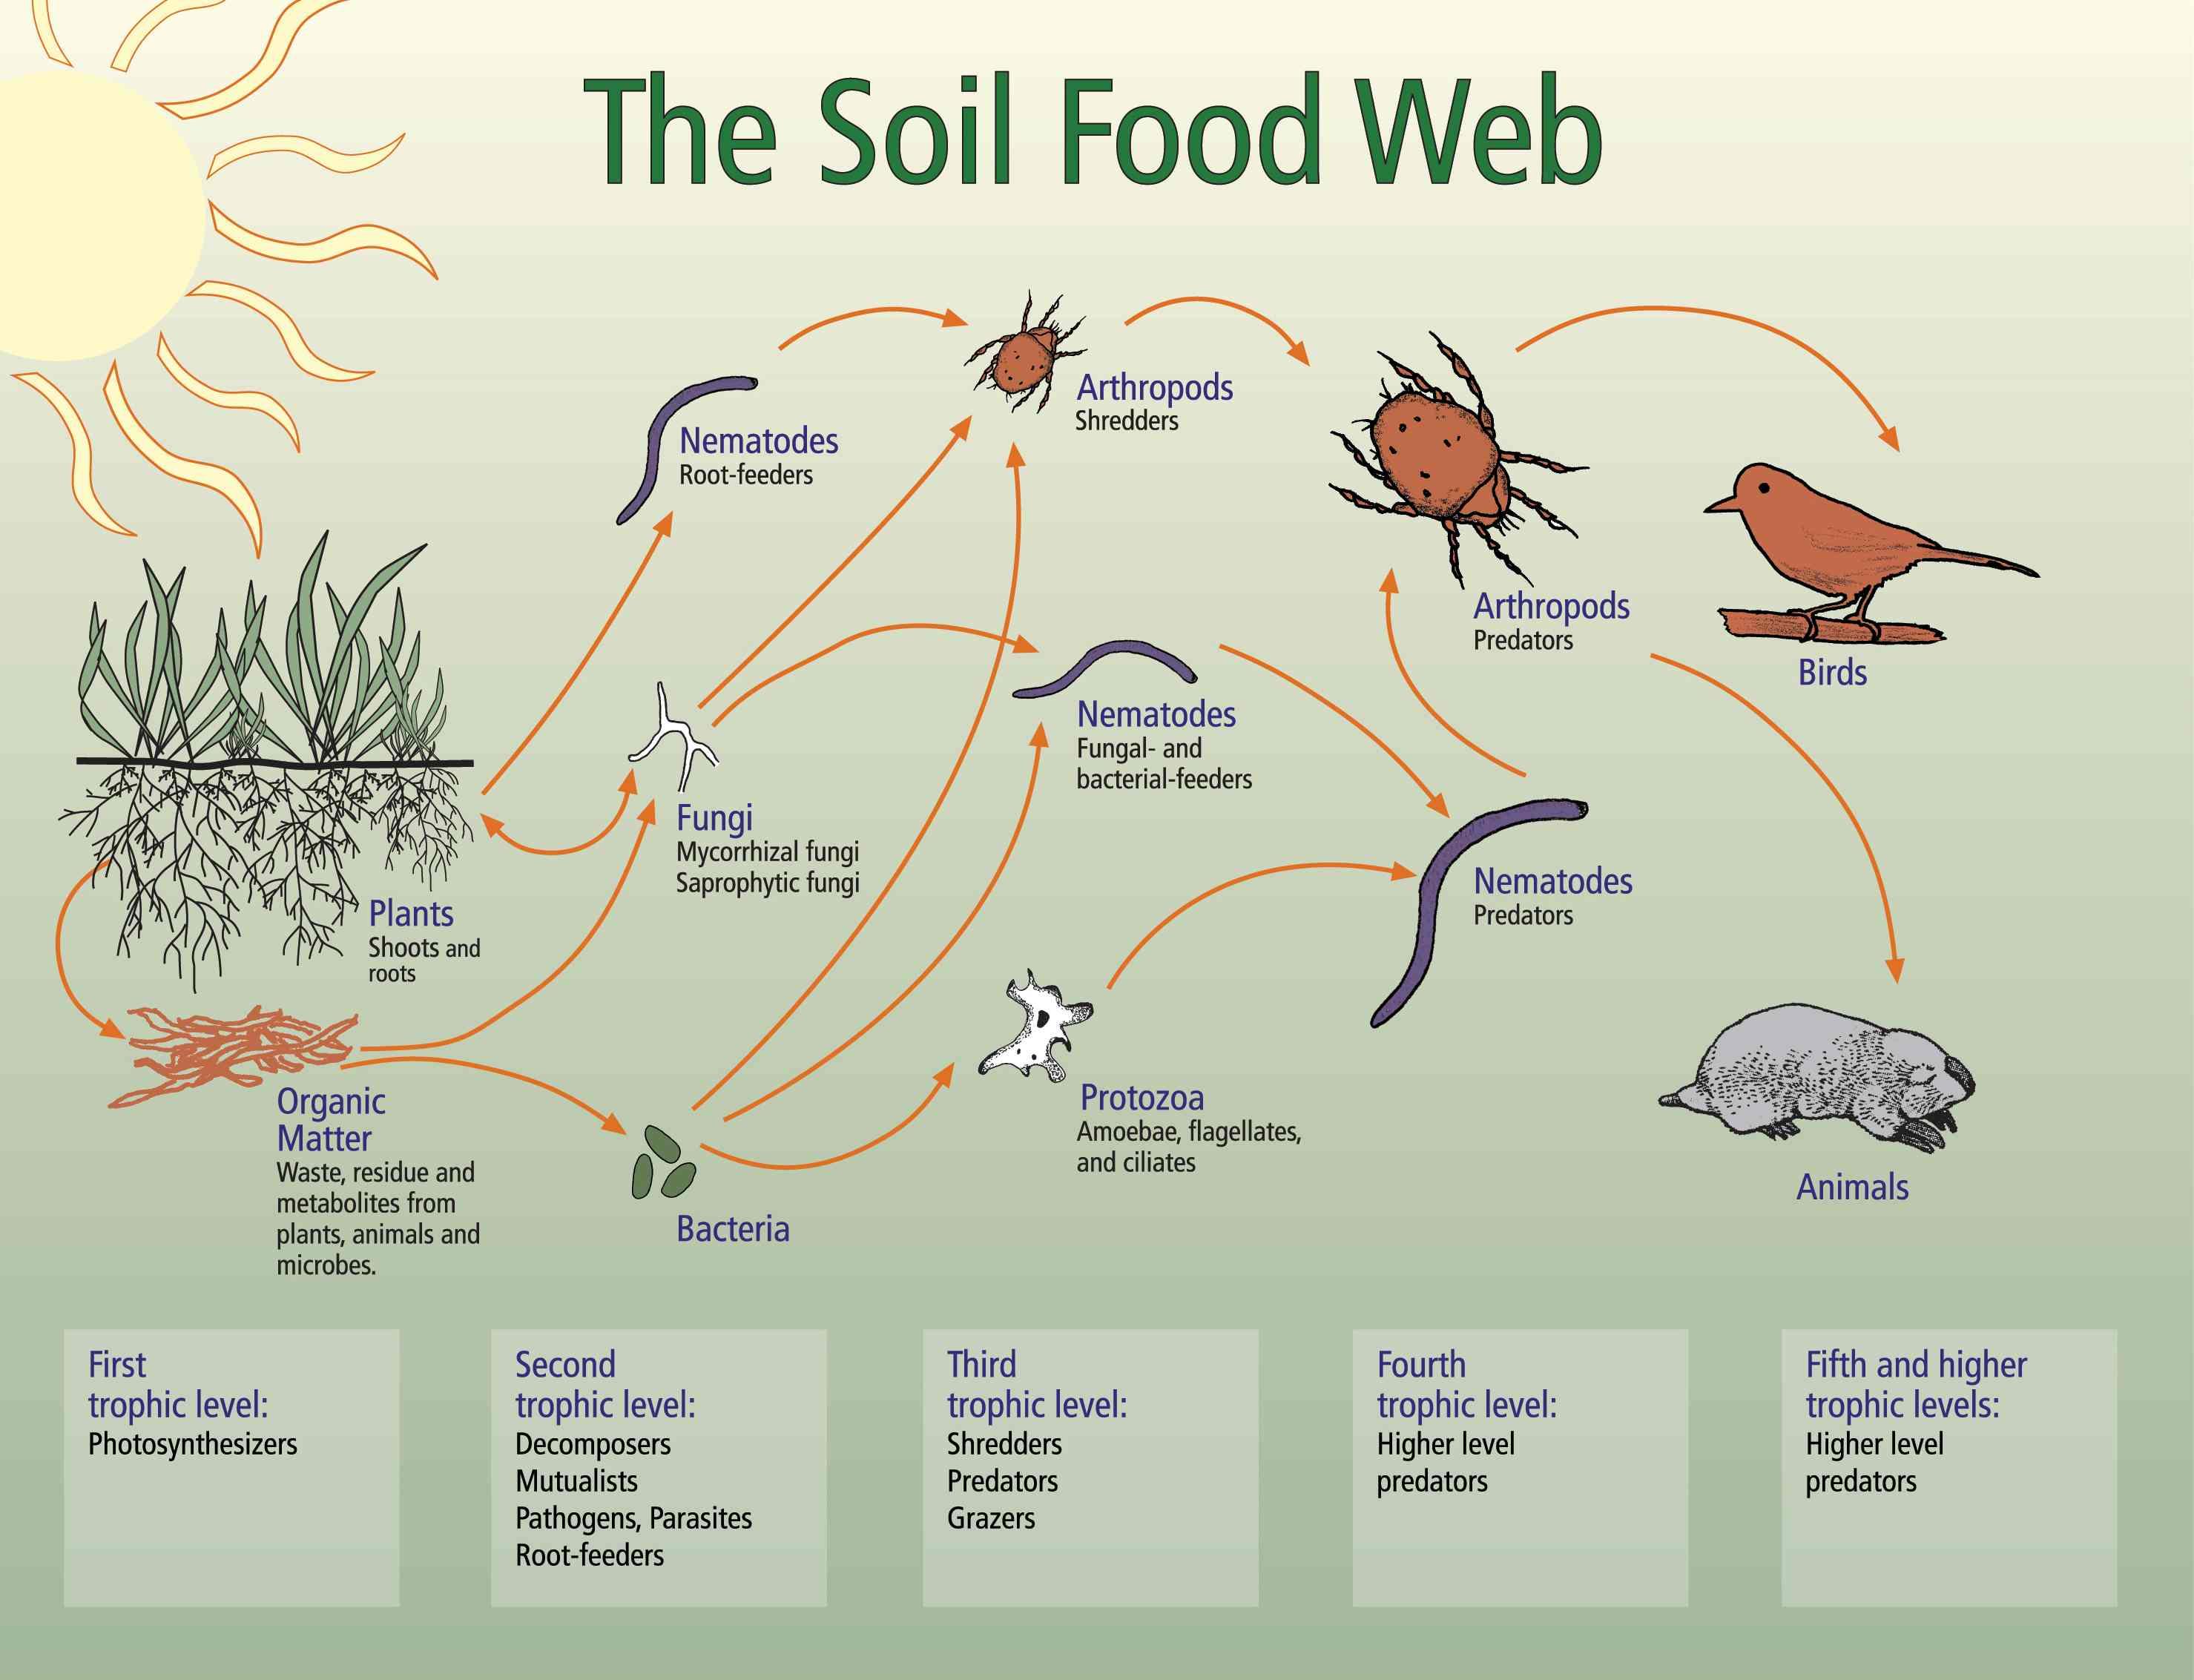 soil-food-web-map-copy.jpg